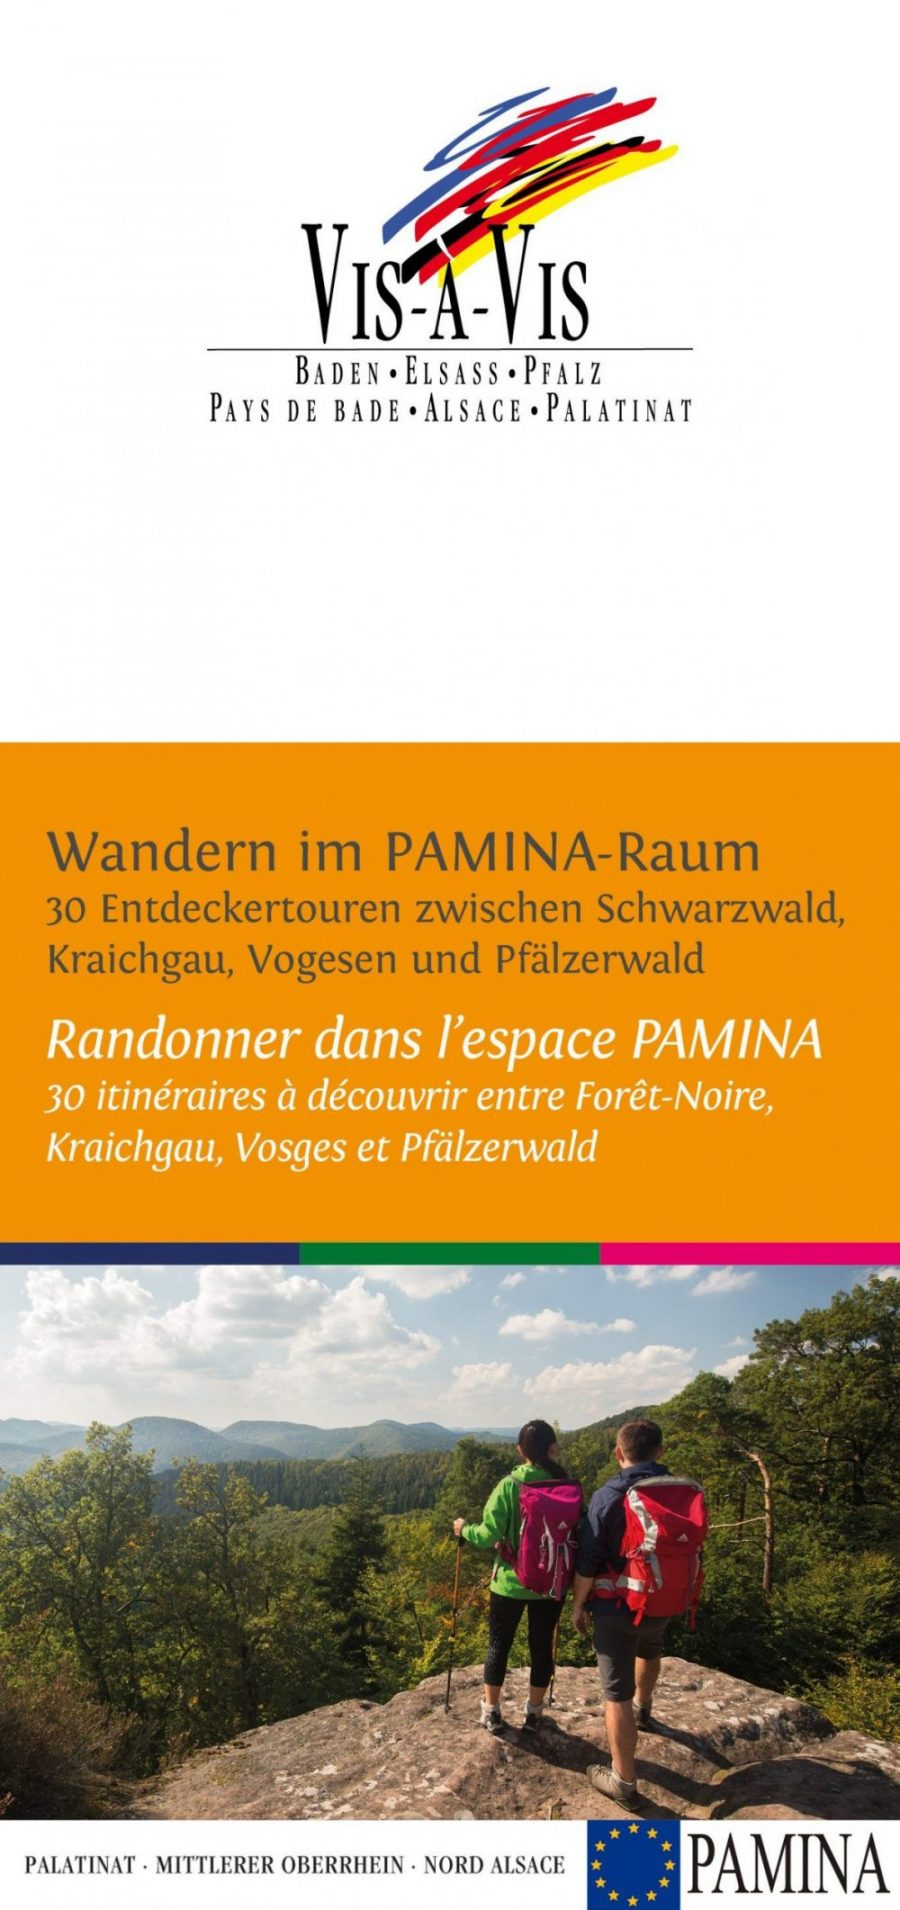 Wanderkarte VIS-á-VIS: Wandern im Pamina-Raum